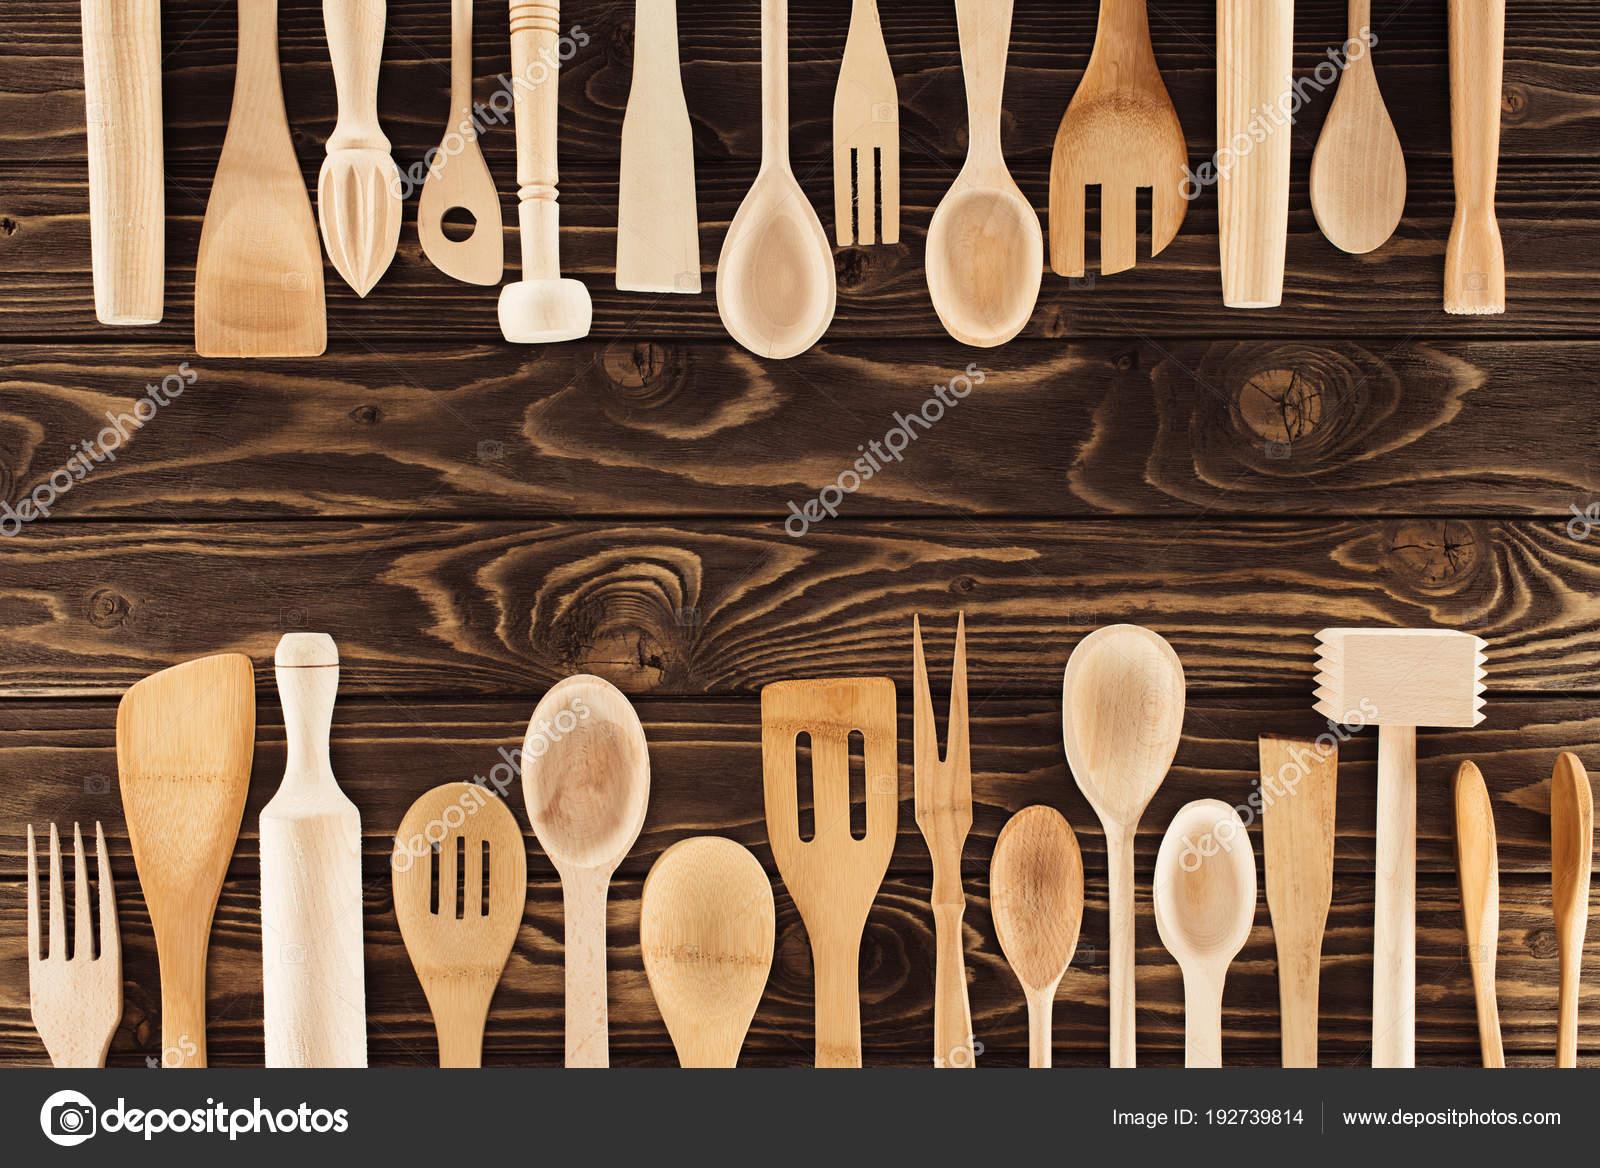 kitchen table high top outdoor cabinets stainless steel 摆放在木桌上的厨房用具的顶部视图 图库照片 c vadimvasenin 192739814